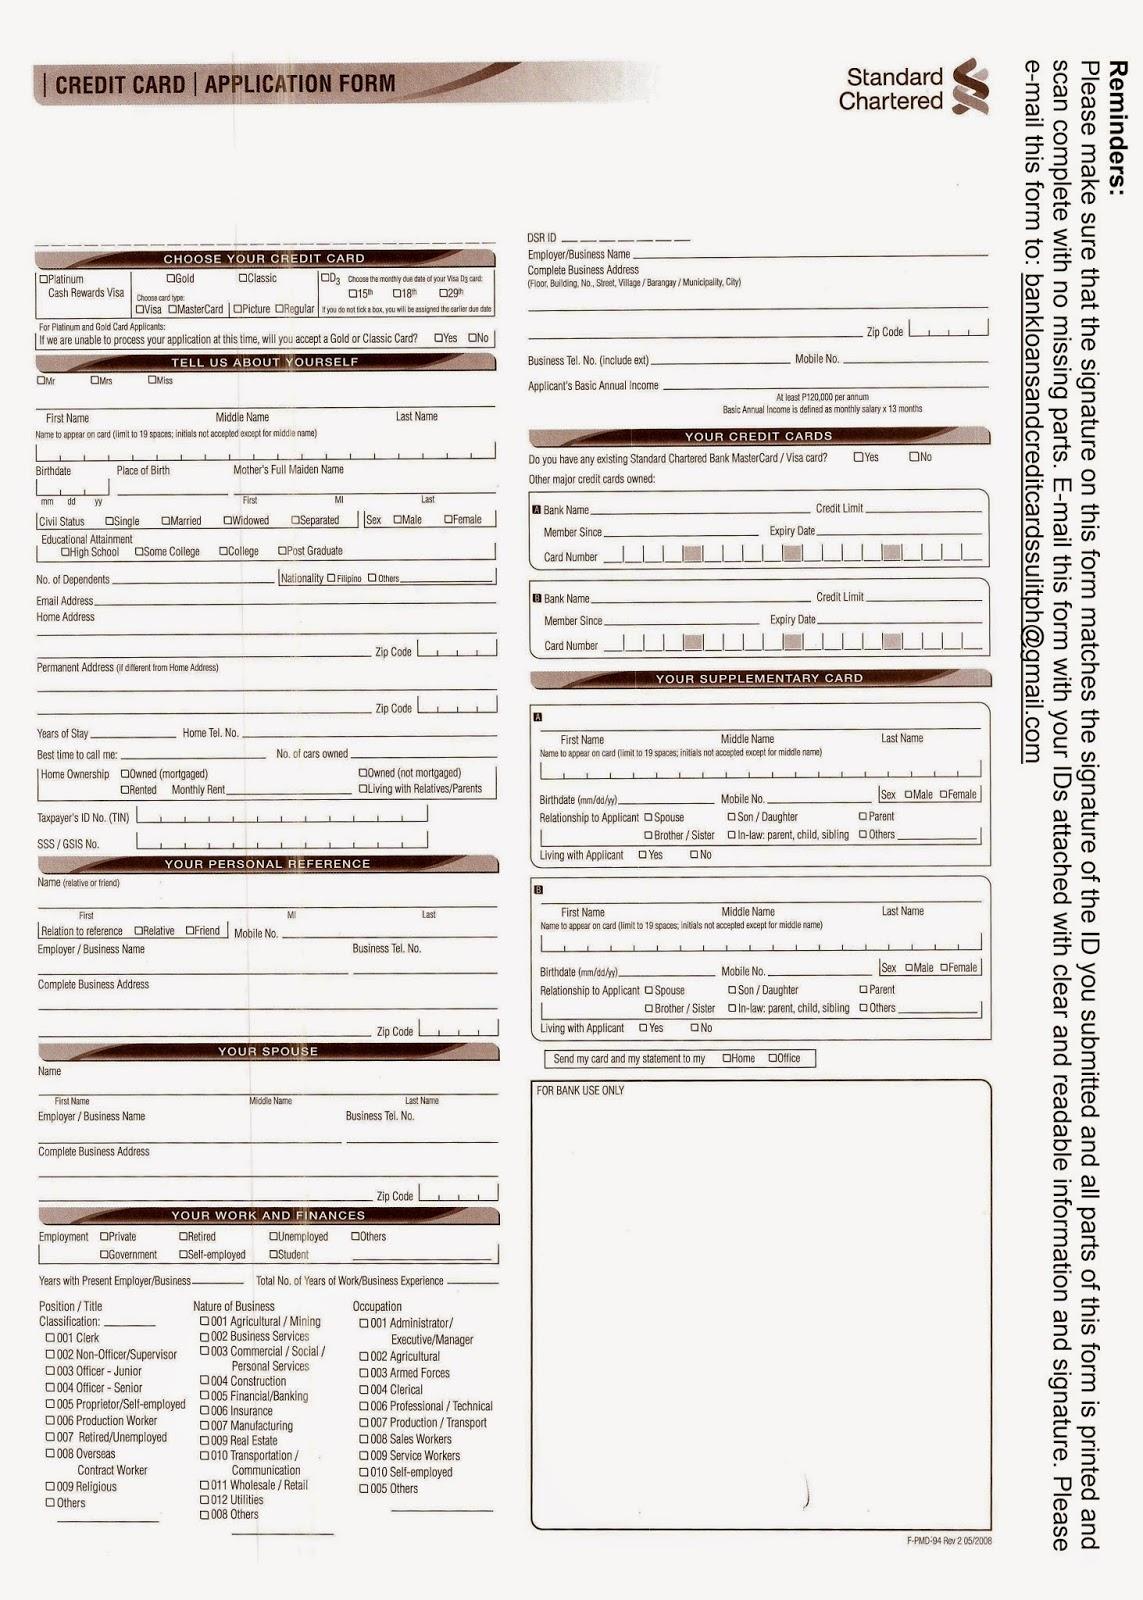 York Immigration Portal